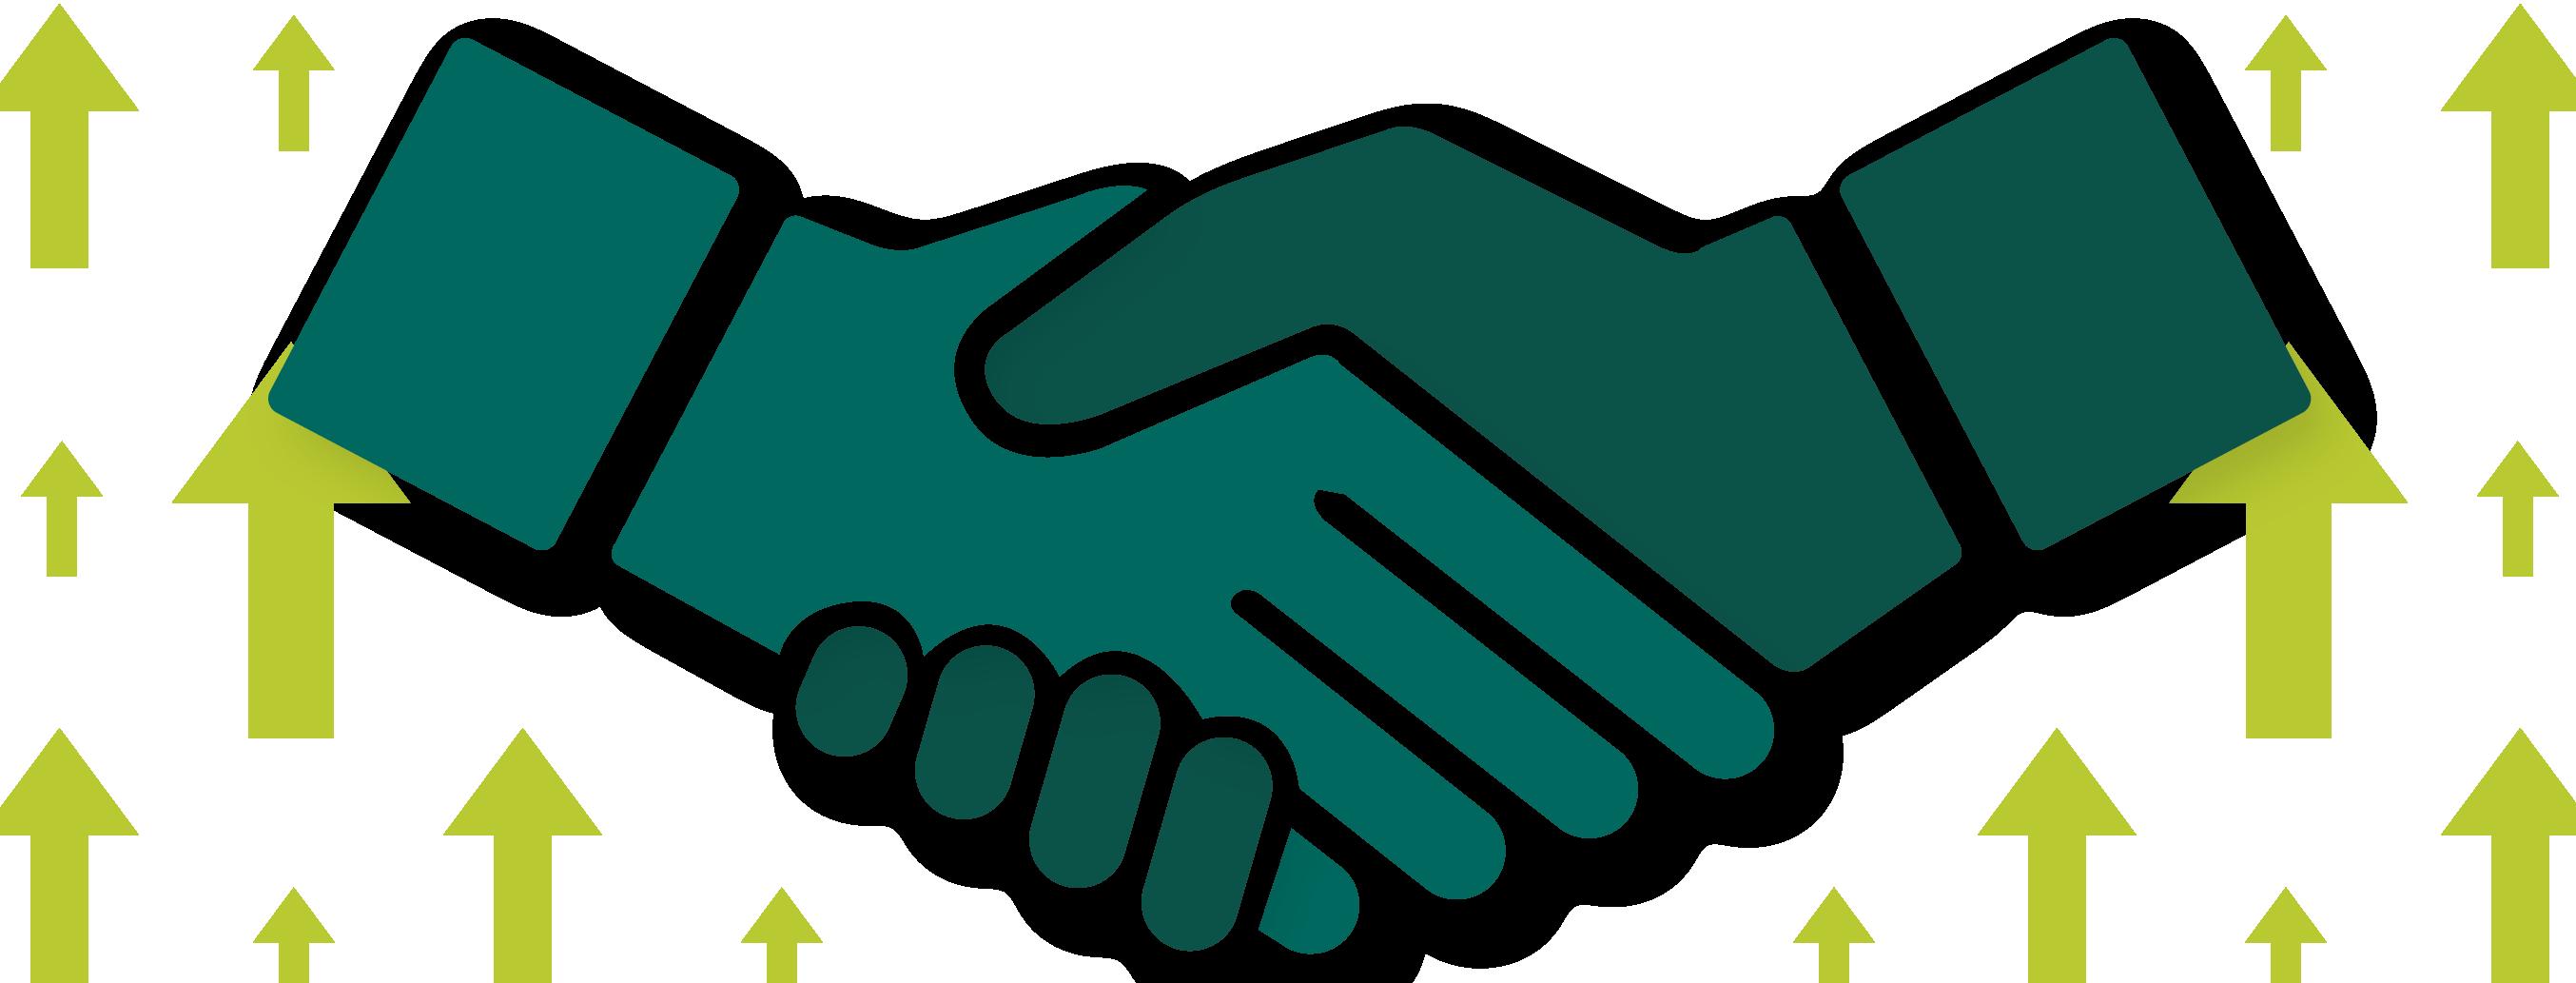 Illustration of shaking hands.